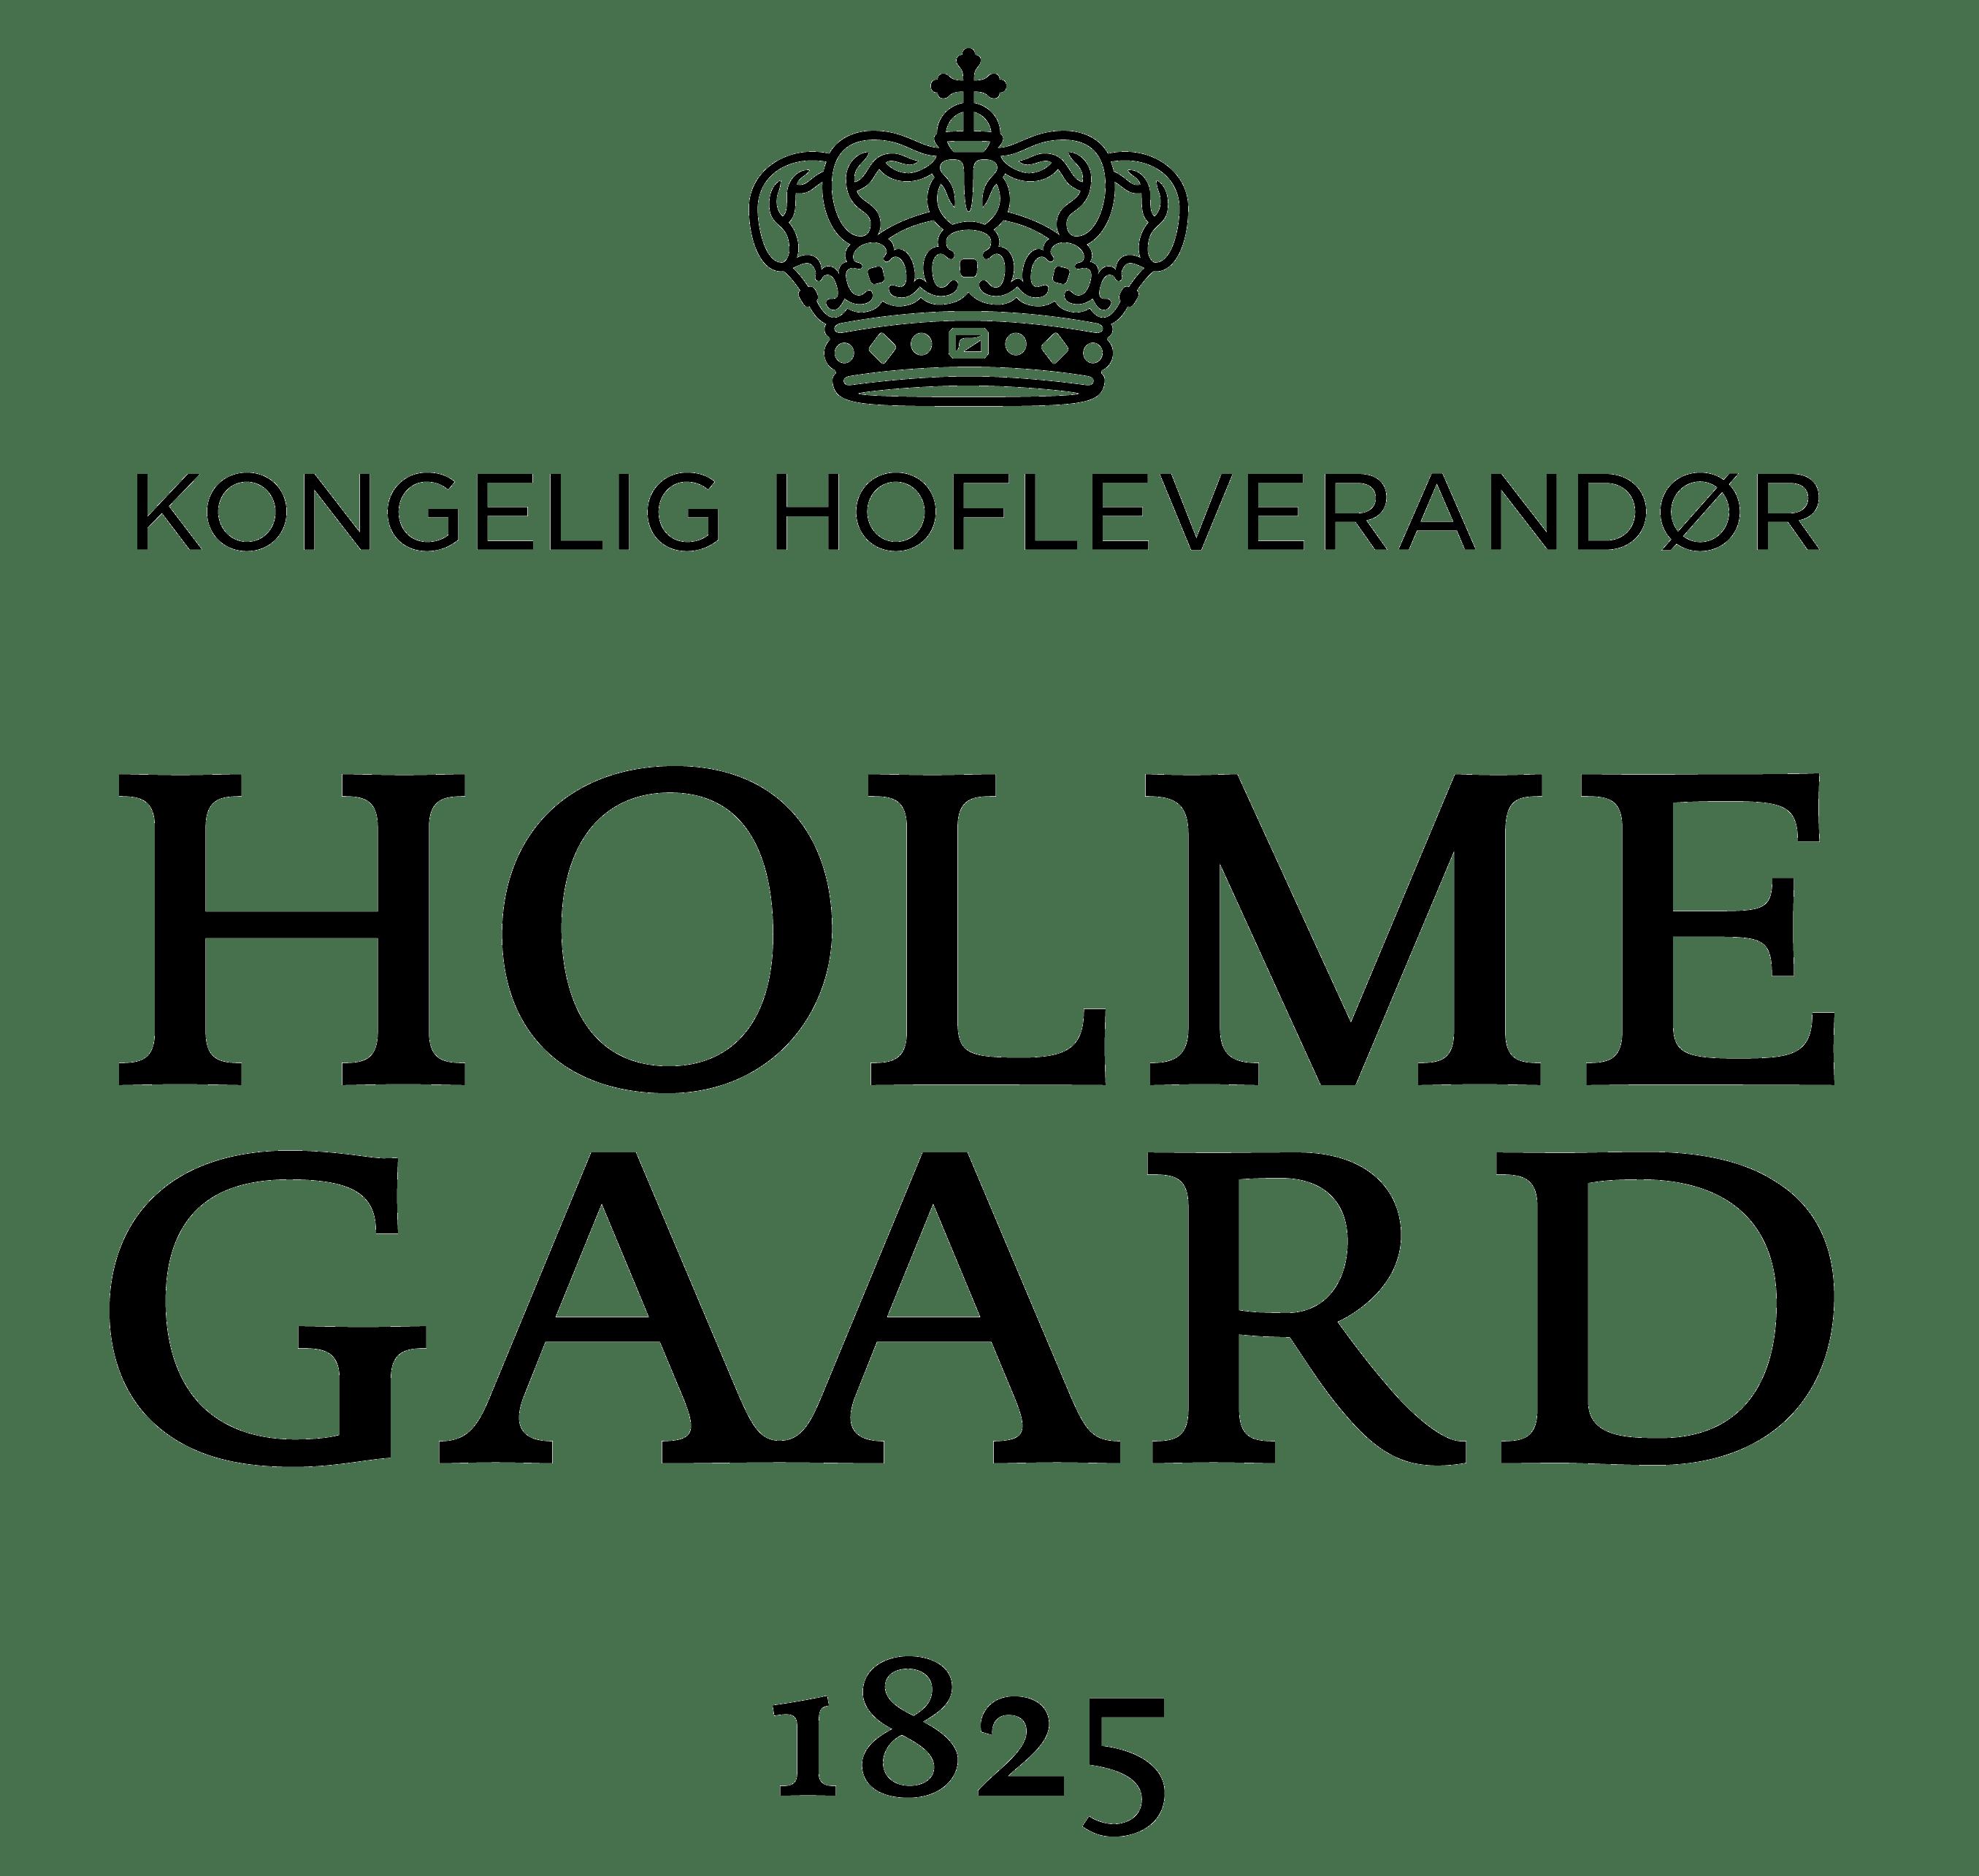 Holmegaard